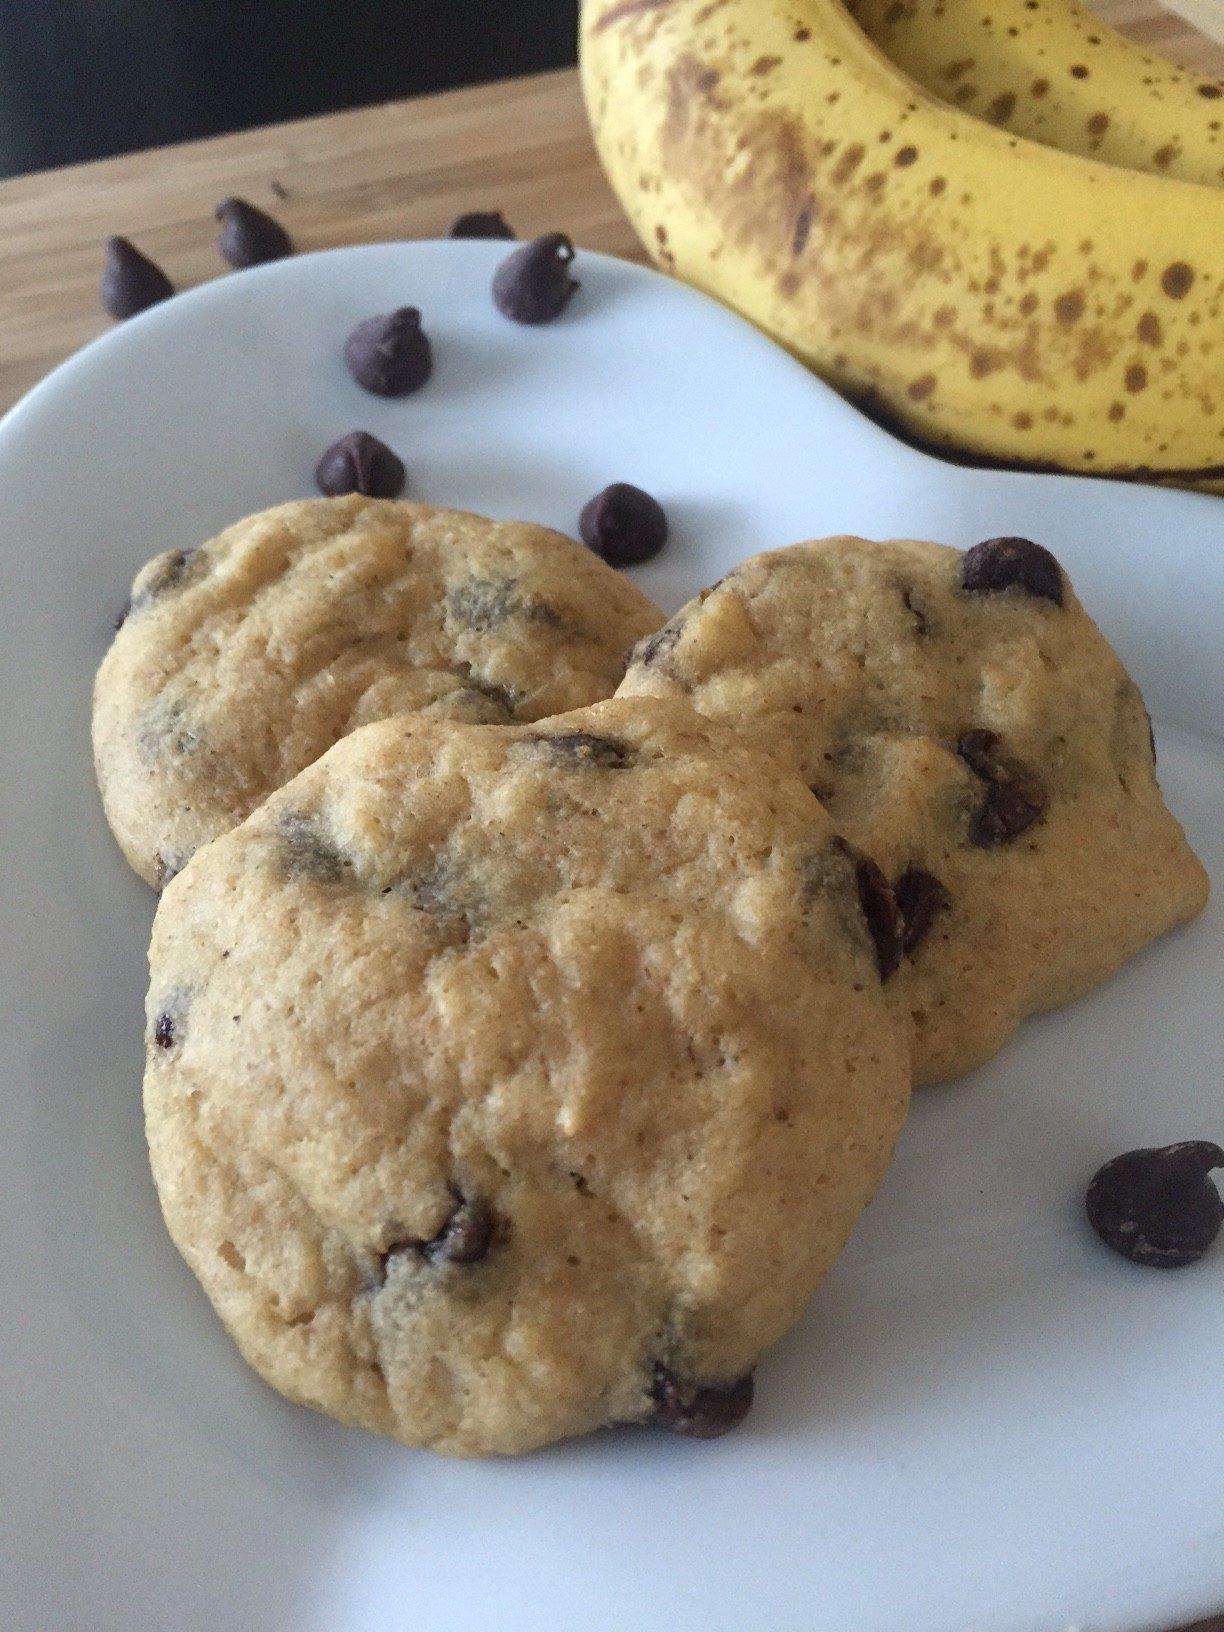 Erin Palinski-Wade's Chocolate Chip Banana Breakfast Cookies